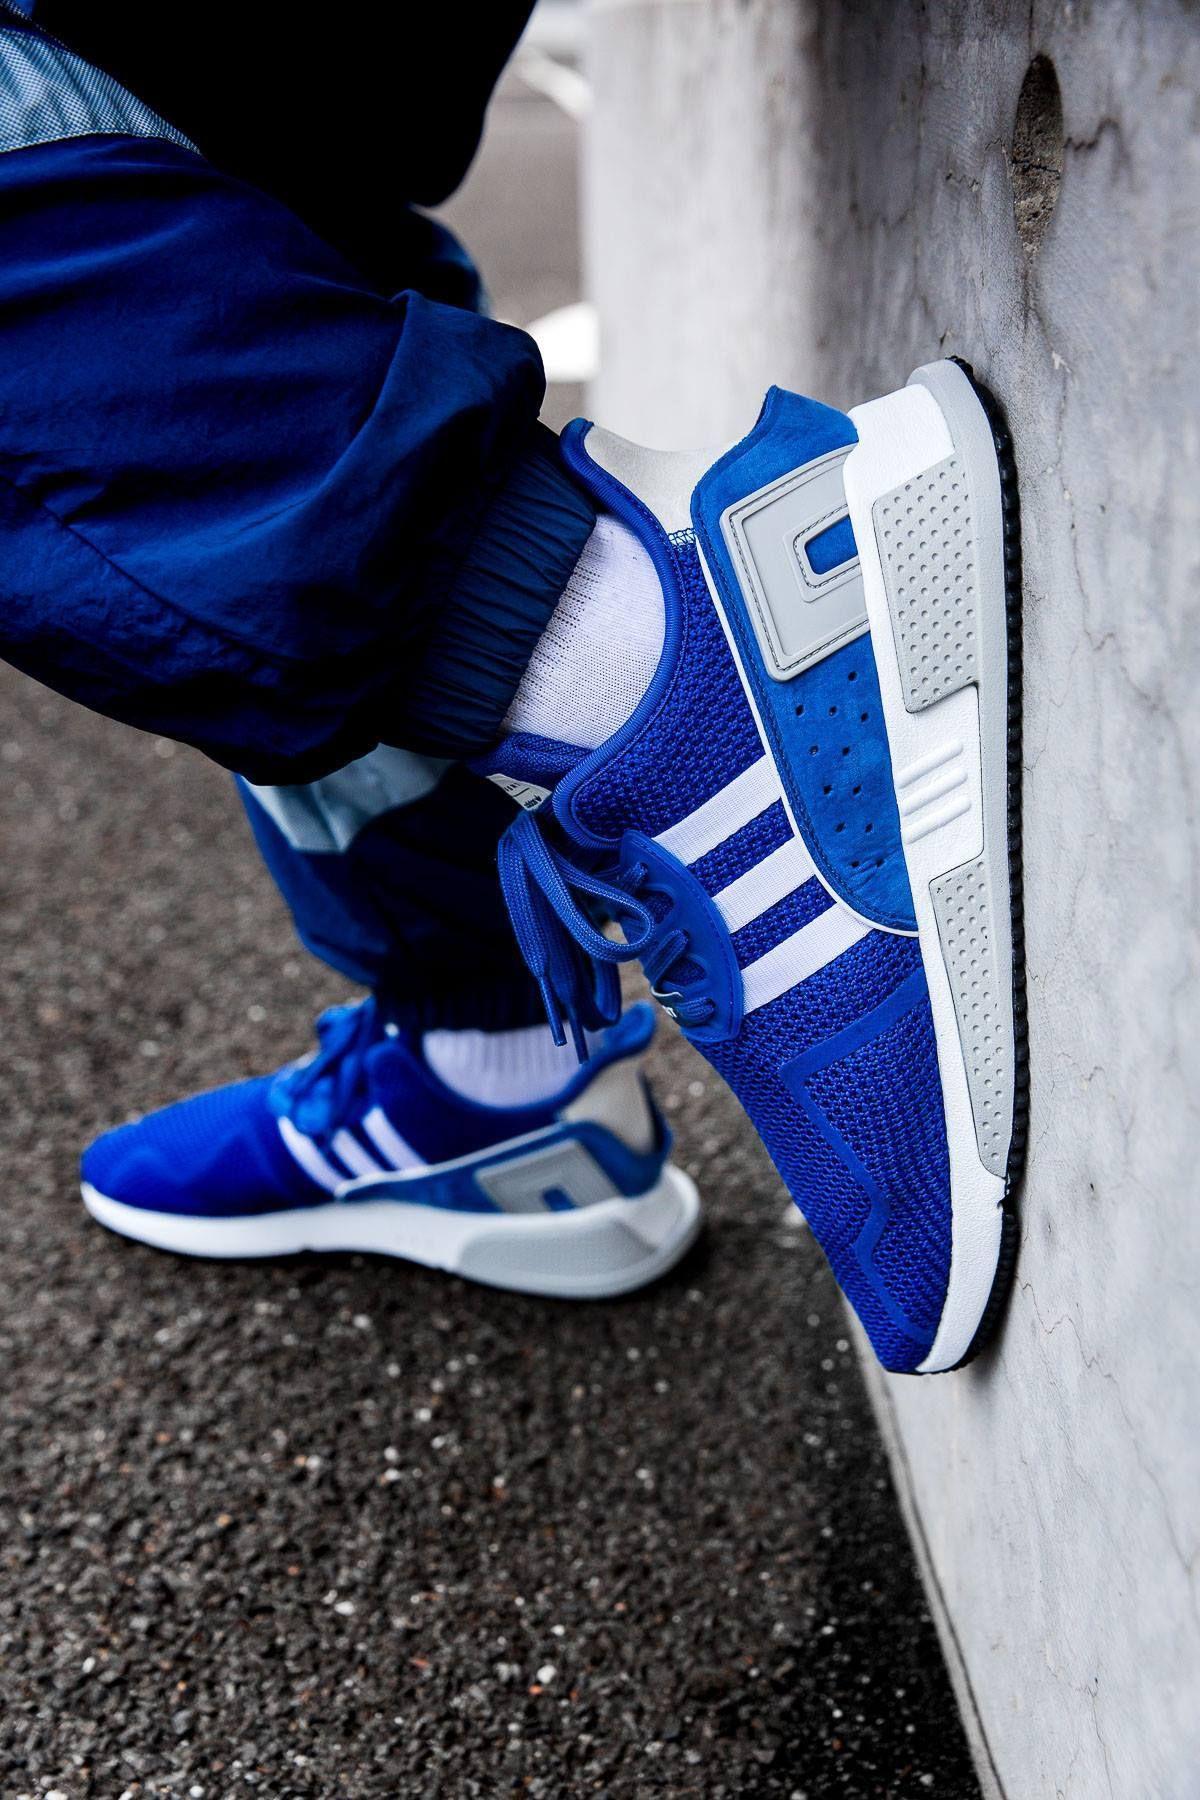 wholesale dealer fba16 ca867 adidas EQT Cushion ADV 'Blue Pack' | CooL Kicks ® | Adidas ...